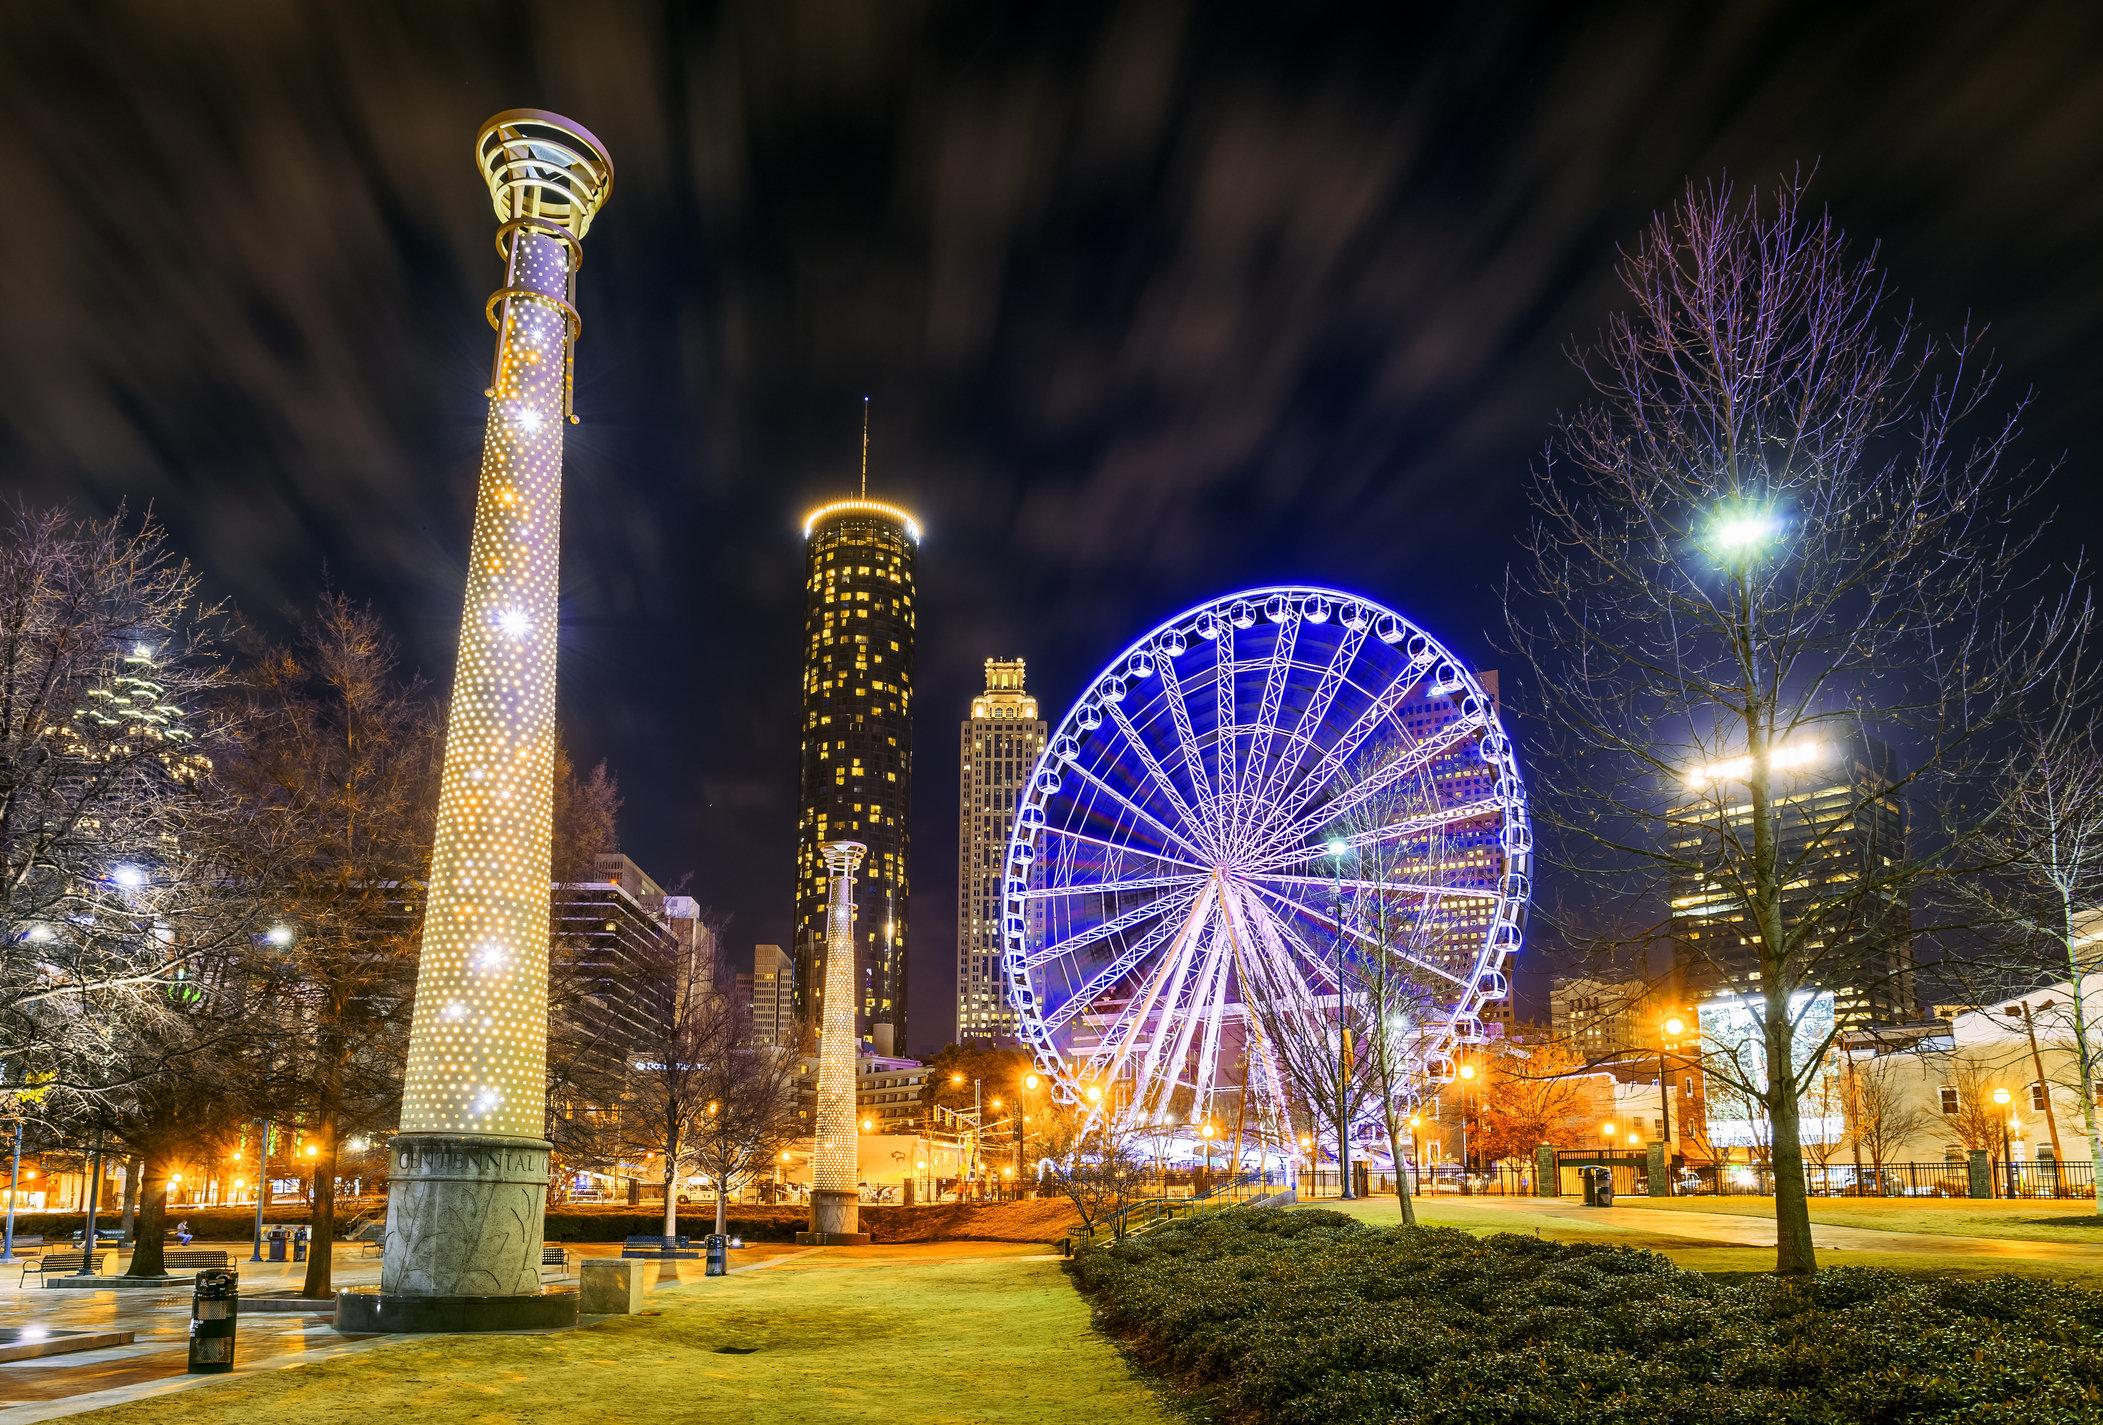 The 15 Most Instagrammable Spots In Atlanta